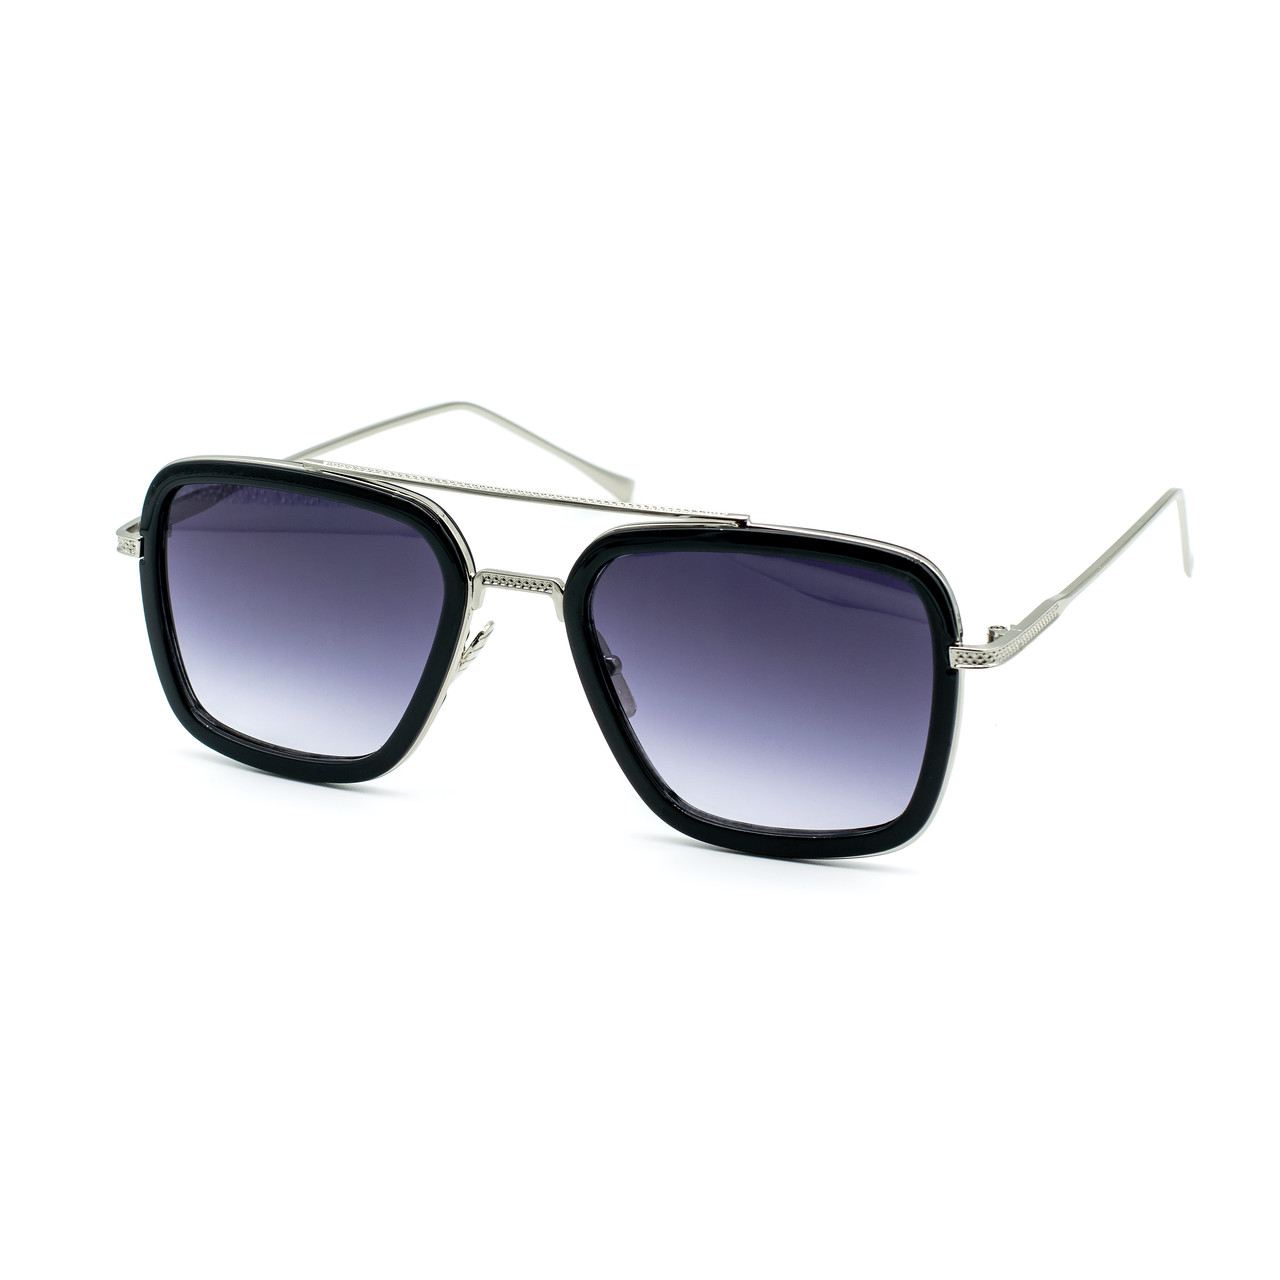 Солнцезащитные очки Dubery - Tony Stark series